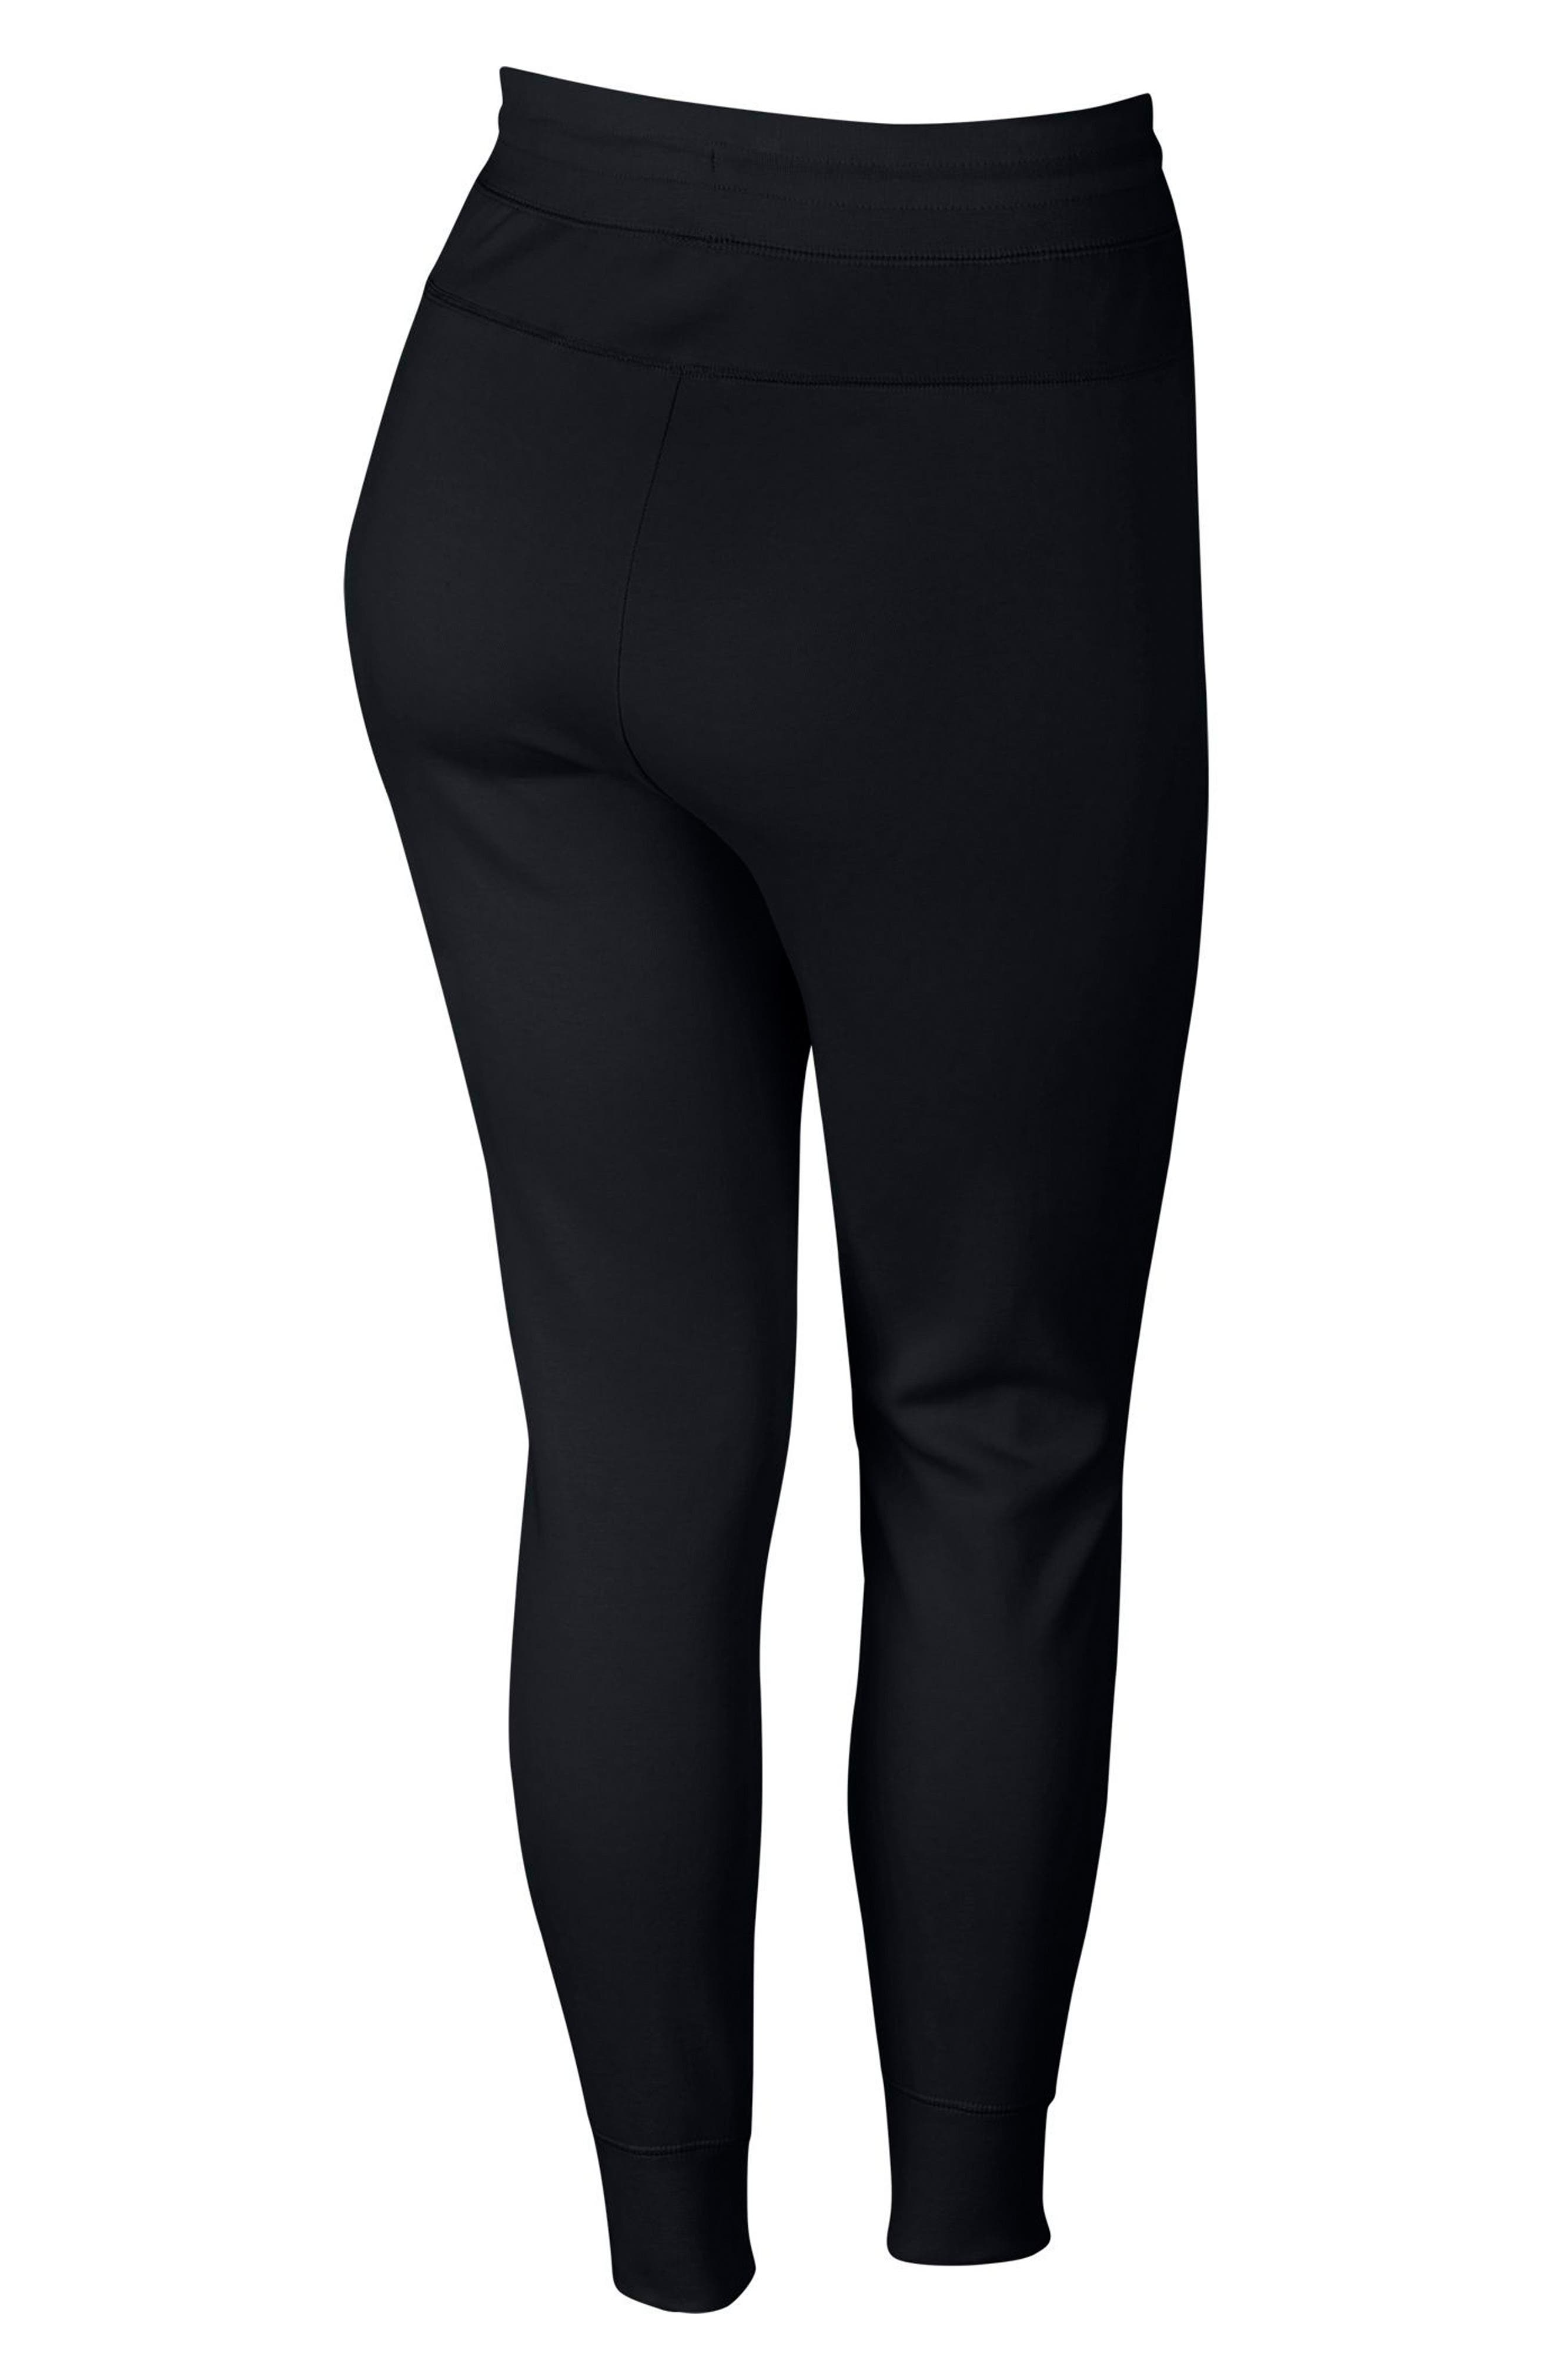 Sportswear High Rise Tech Fleece Jogger Pants,                             Alternate thumbnail 8, color,                             BLACK/ BLACK/ WHITE